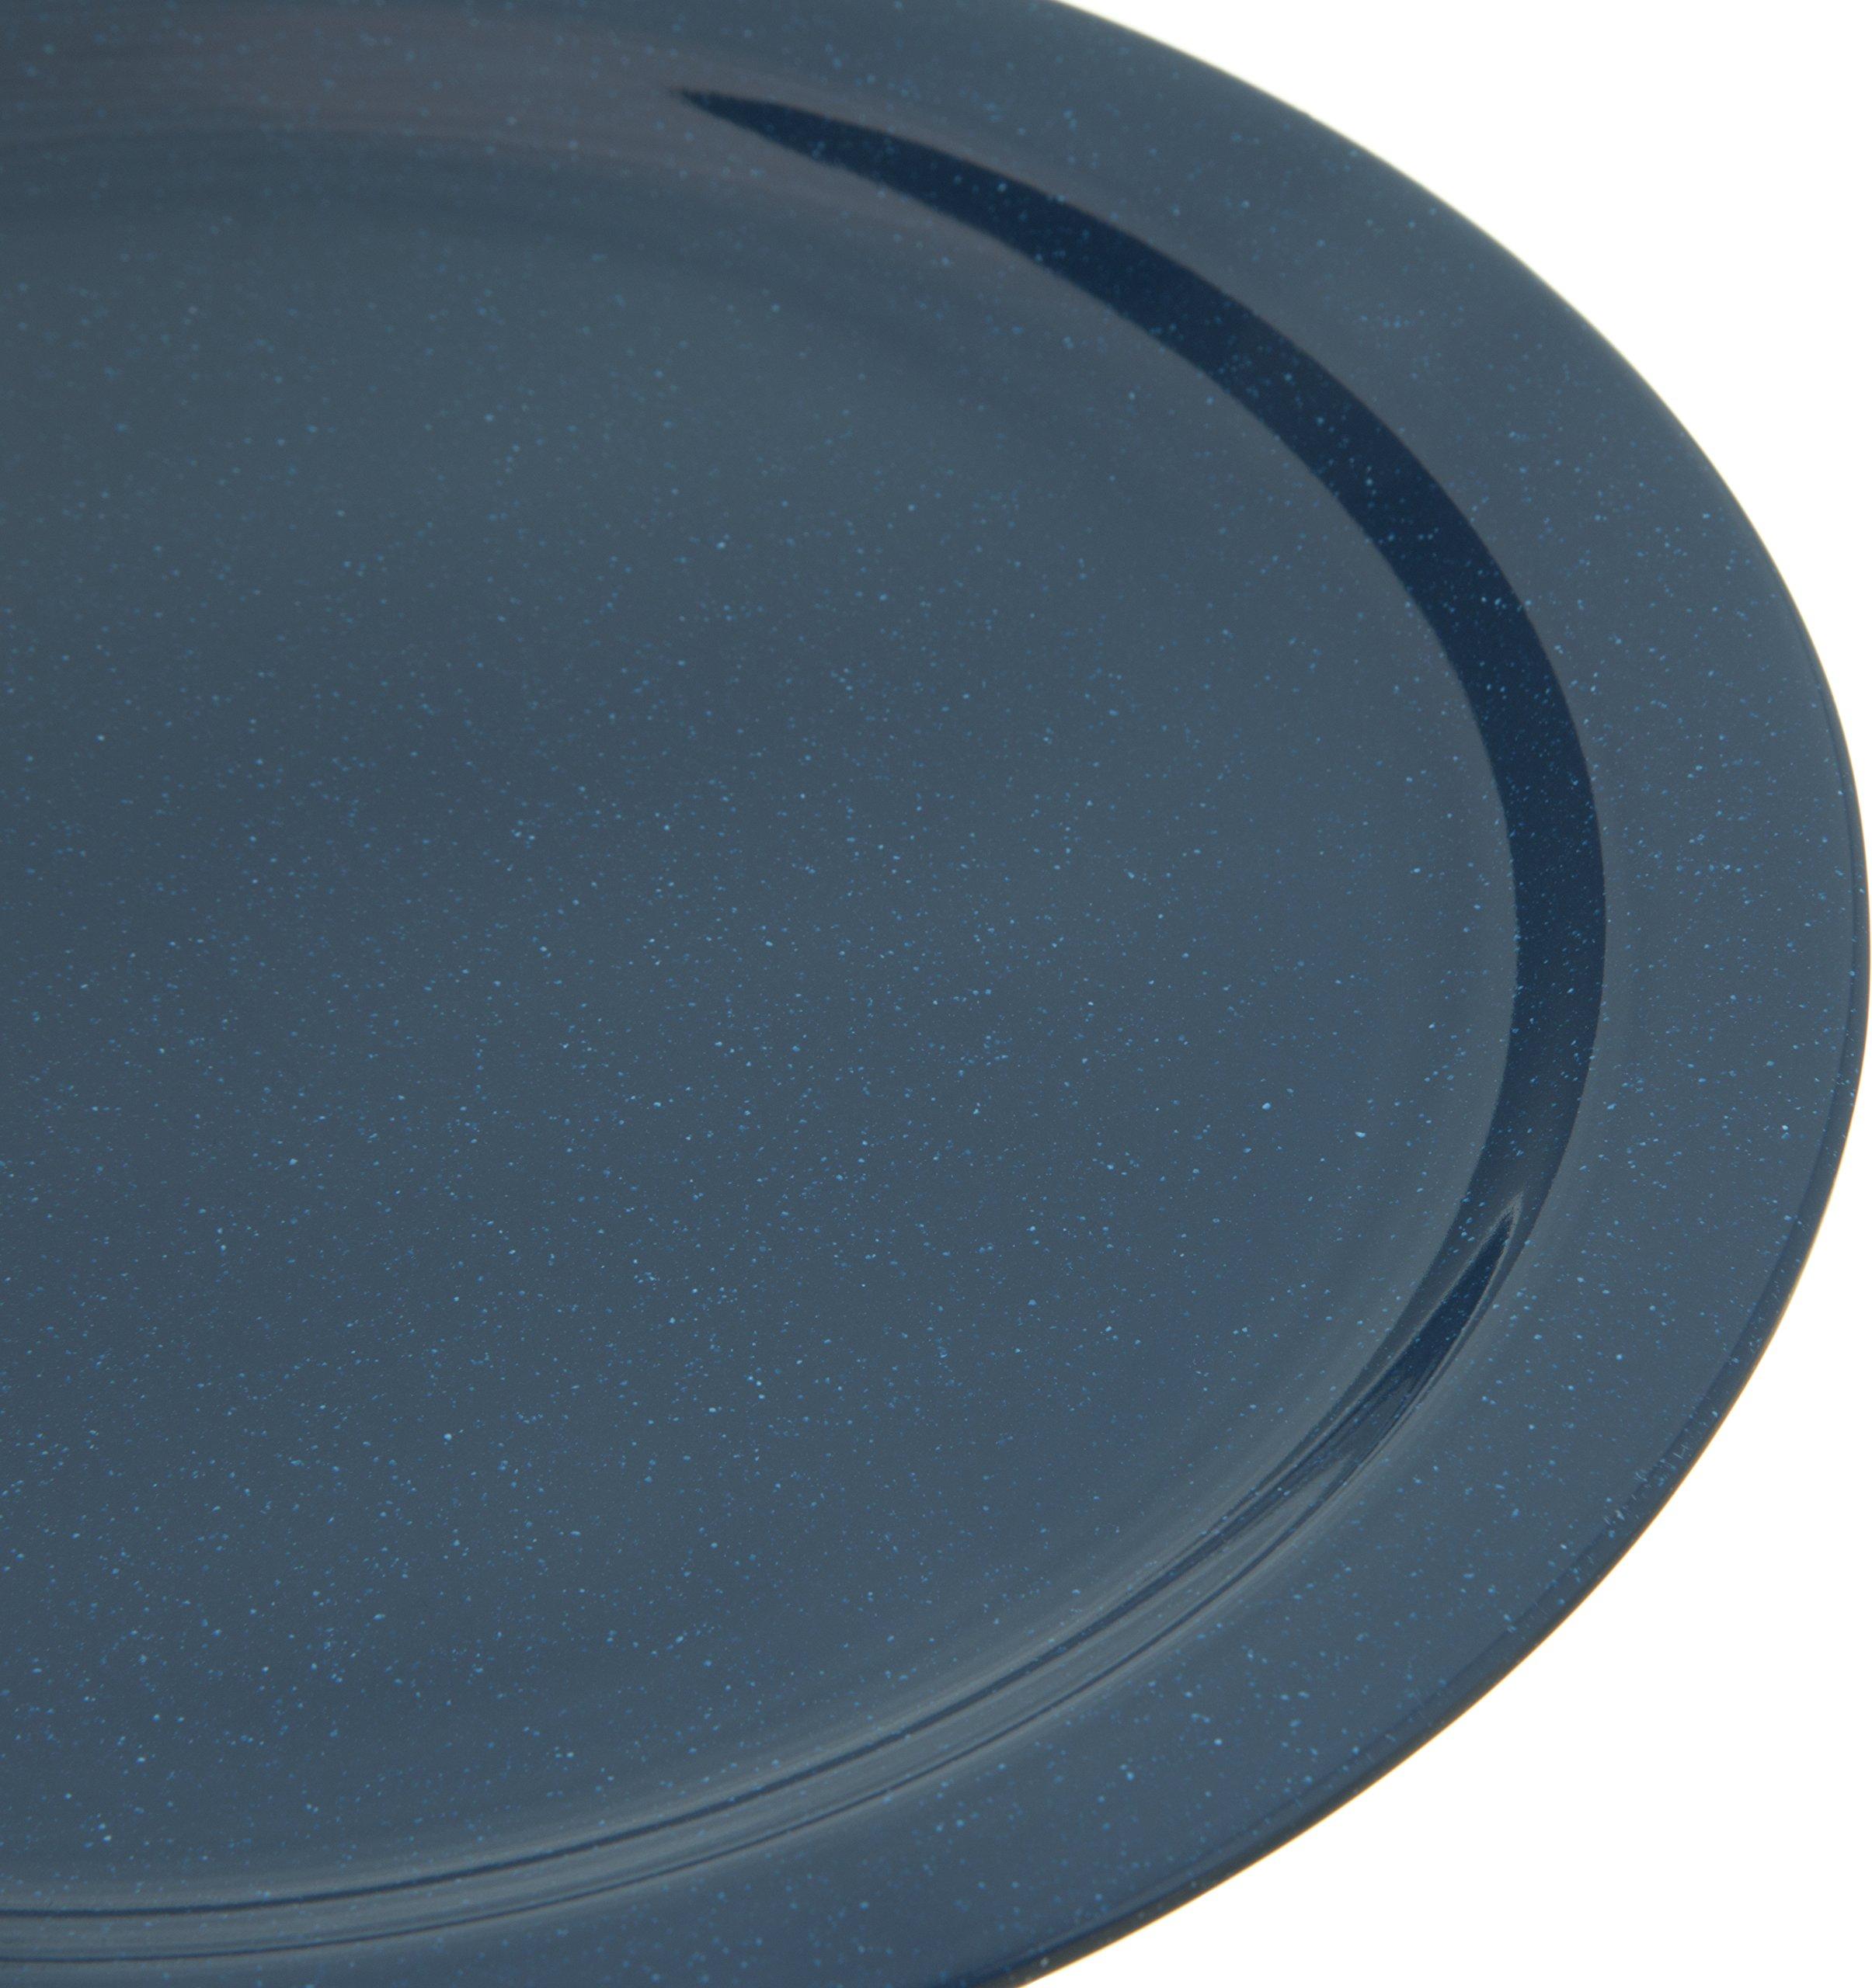 Carlisle 4350035 Dallas Ware Melamine Dinner Plate, 10.20'' Dia. x 0.84'' H, Cafe Blue (Case of 48) by Carlisle (Image #4)